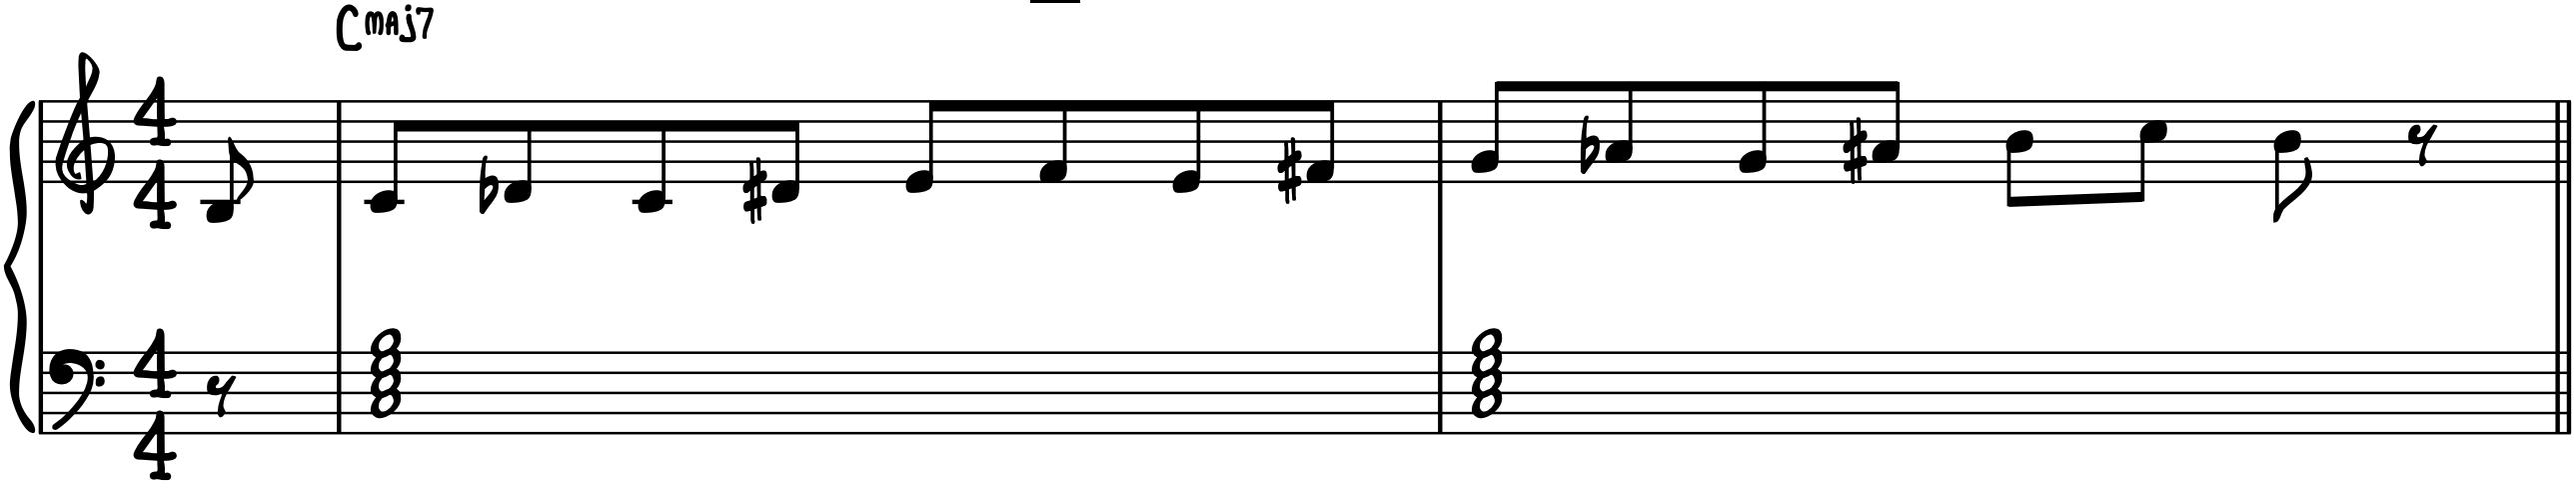 C Major 7 Exercise to play bebop piano improv soloing improvisation jazz